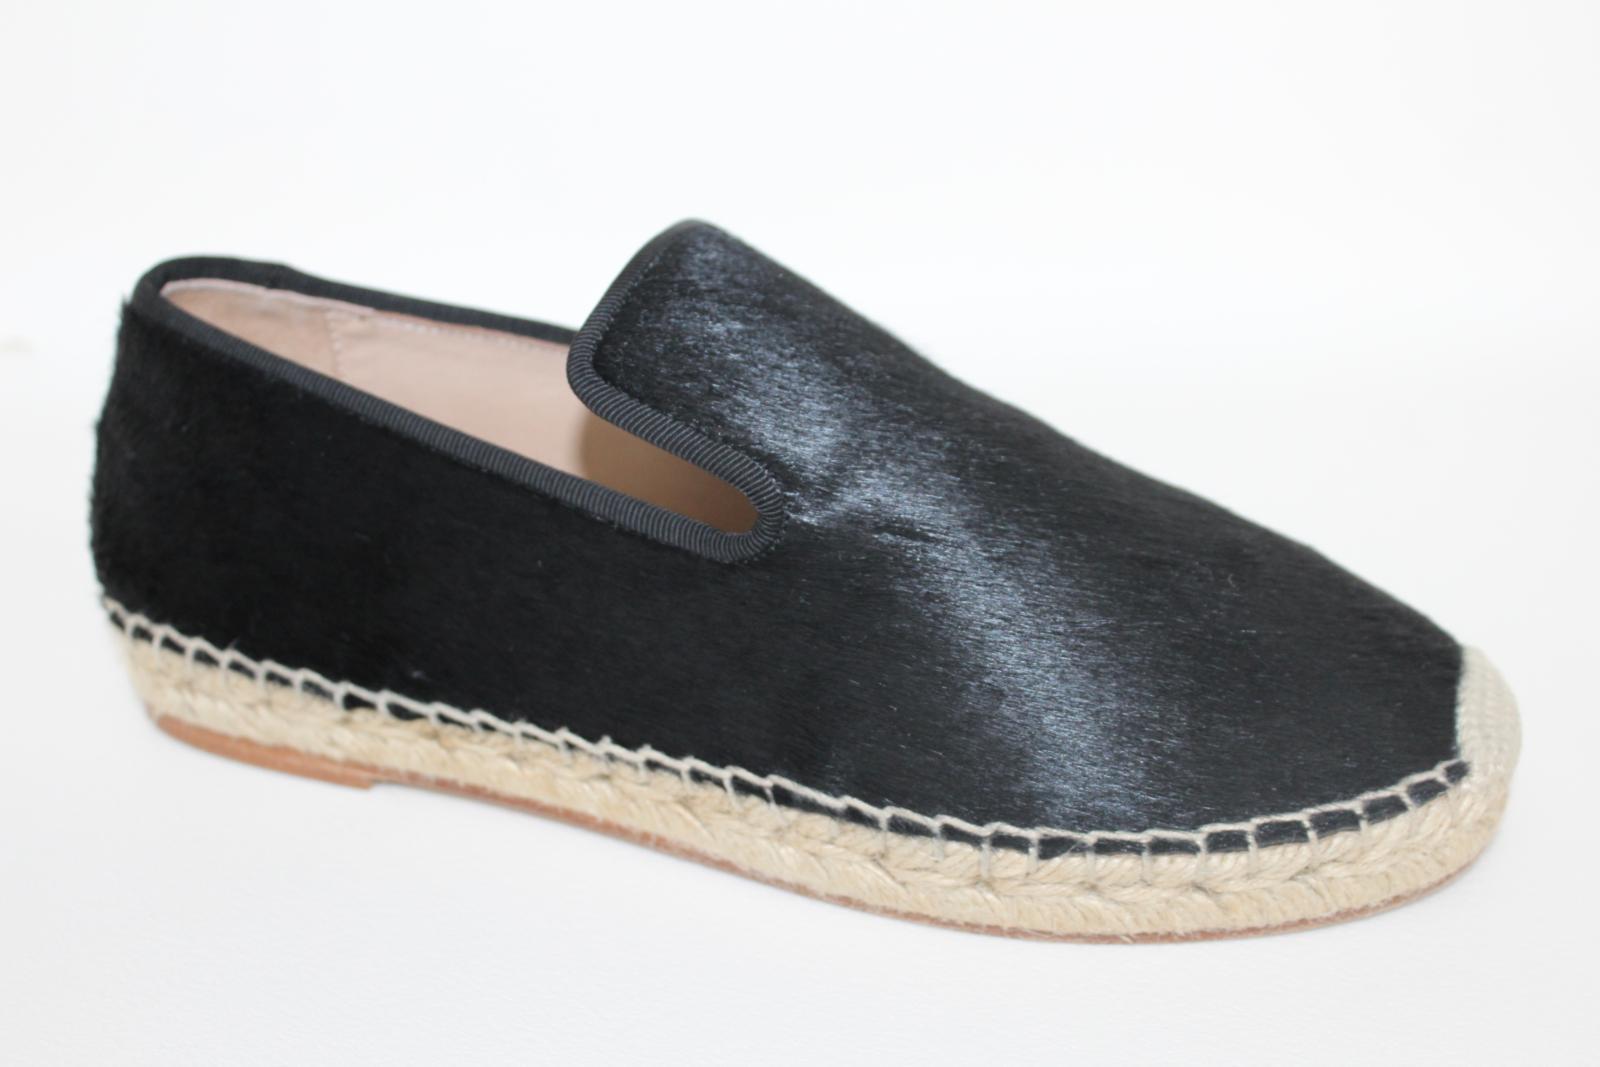 CELINE-Stacy-Black-Pony-Hair-Ladies-Flat-Espadrilles-Shoes-UK3-EU36-5-BNIB thumbnail 4